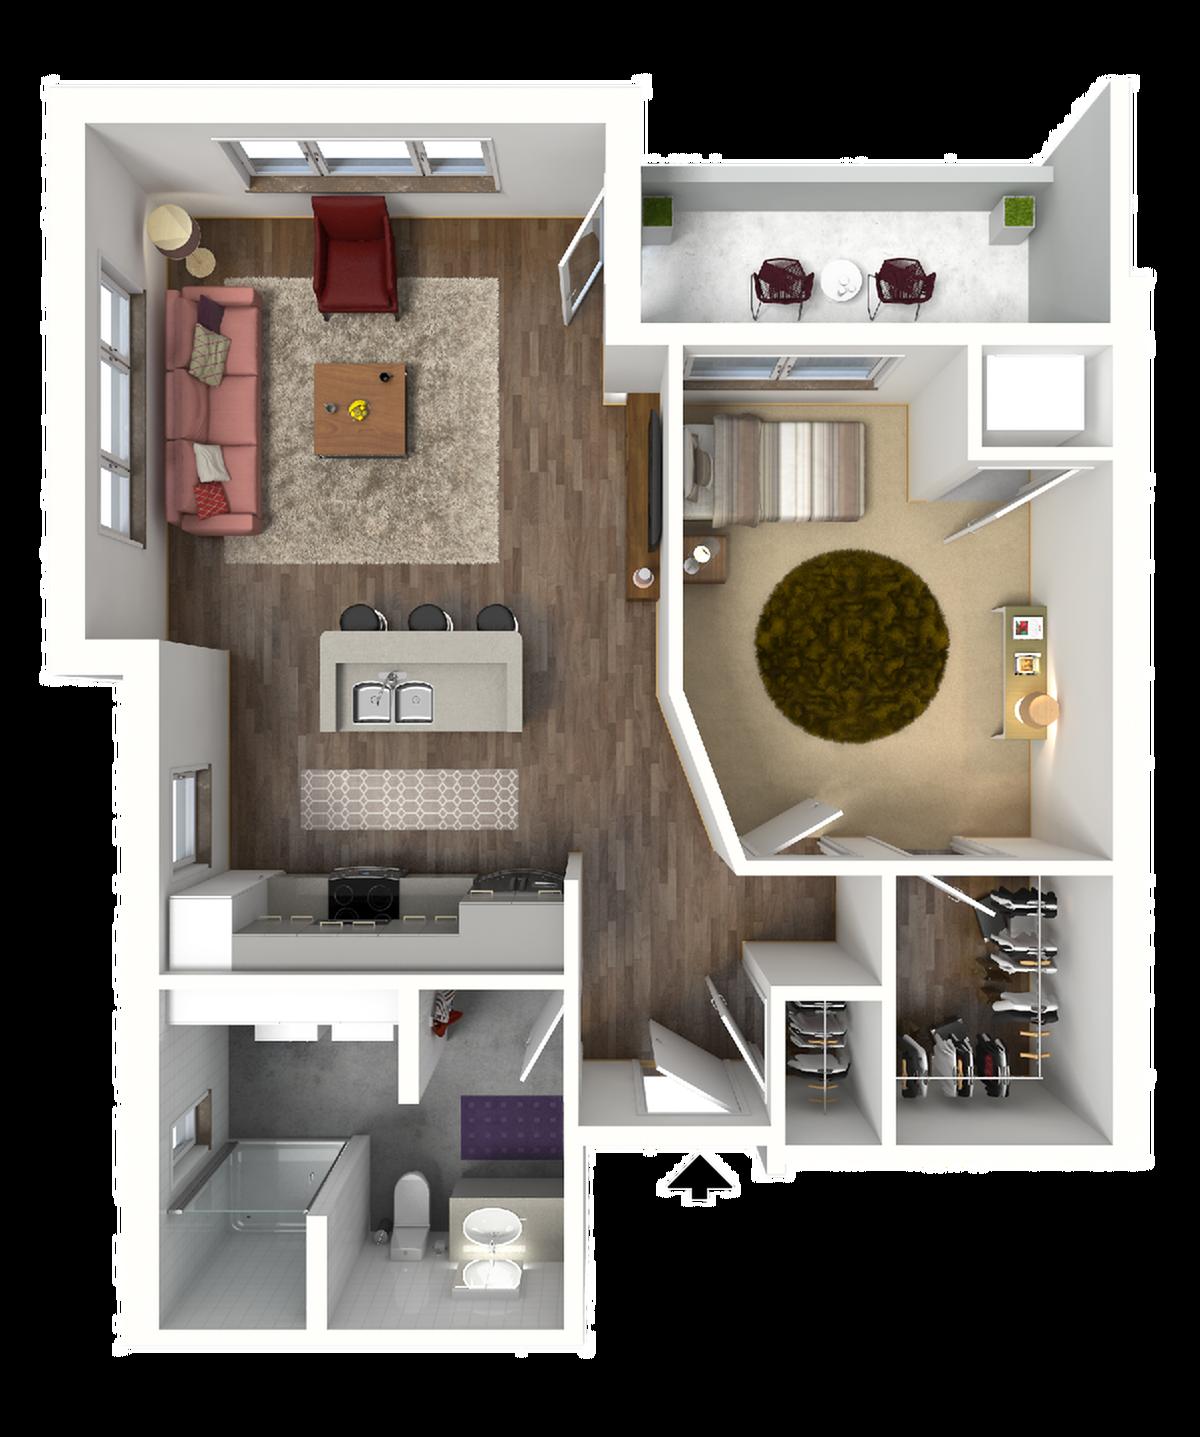 4 Bedroom Apartments Madison Wi Luxury Studio 1 2 Amp 3 Bed Apts In Madison Wi 22 Slate